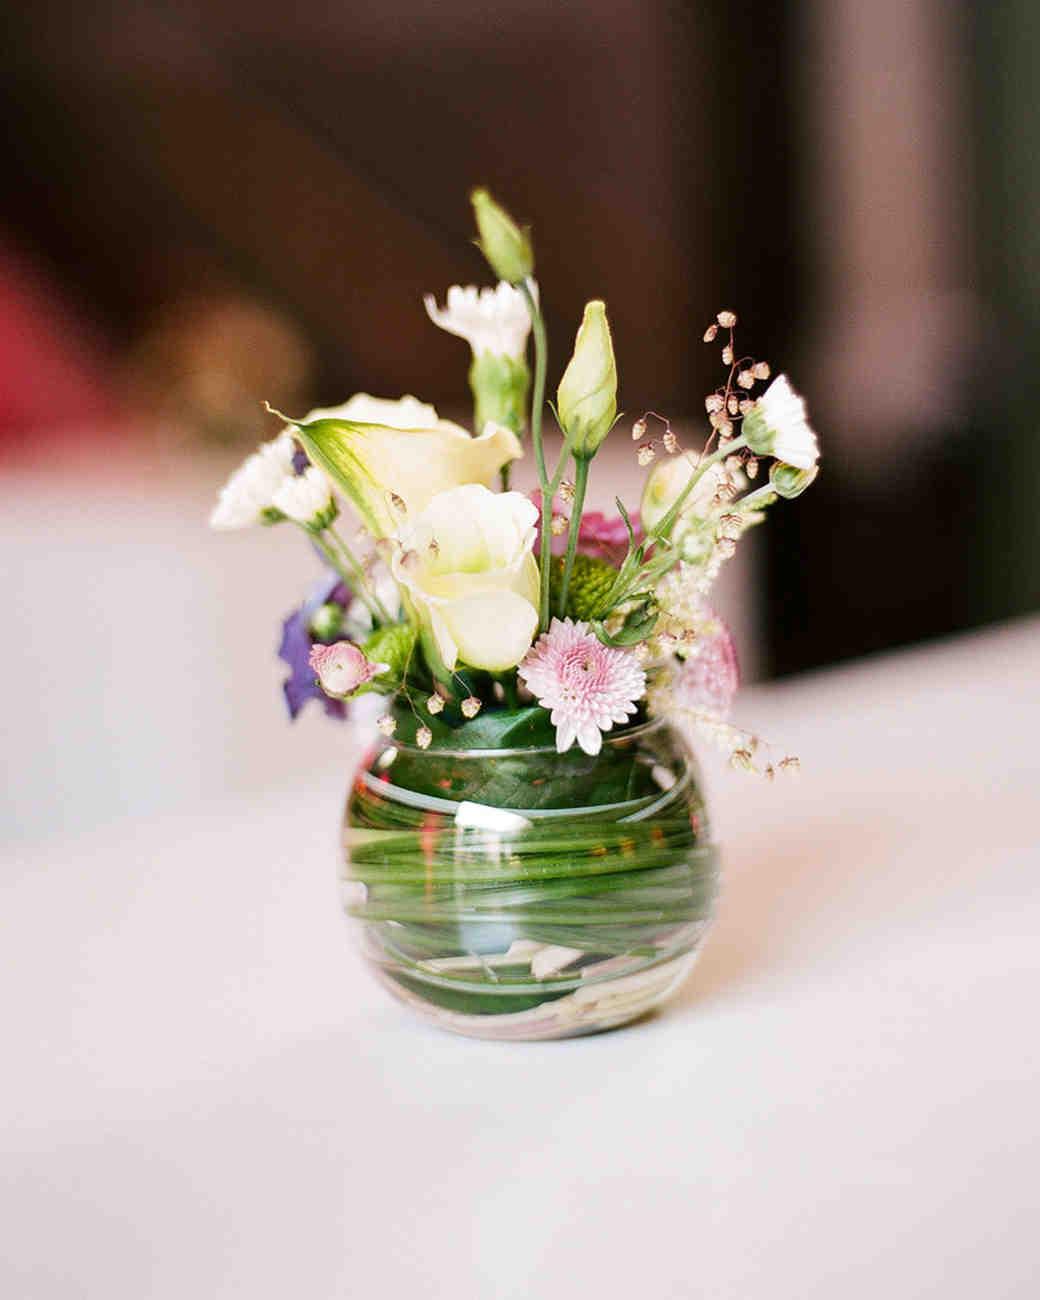 Affordable Wedding Centerpieces That Still Look Elevated  Martha Stewart Weddings